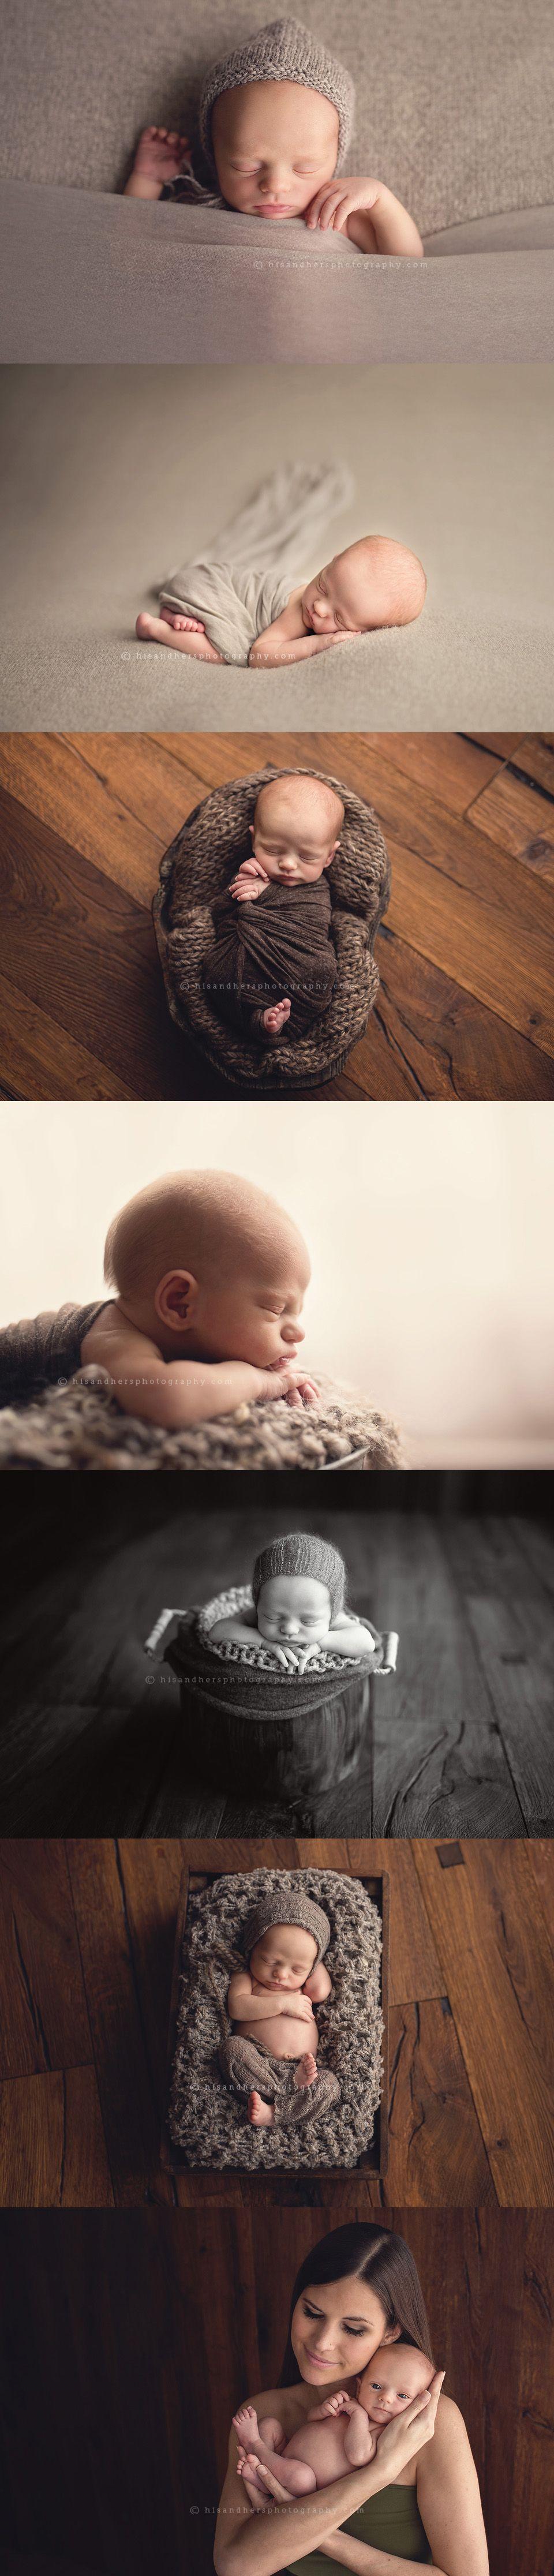 Des Moines, Iowa newborn photographer - preemie Knox 2 weeks old.  #desmoines #iowa #newborn #photographer | His & Hers | Des Moines, Iowa